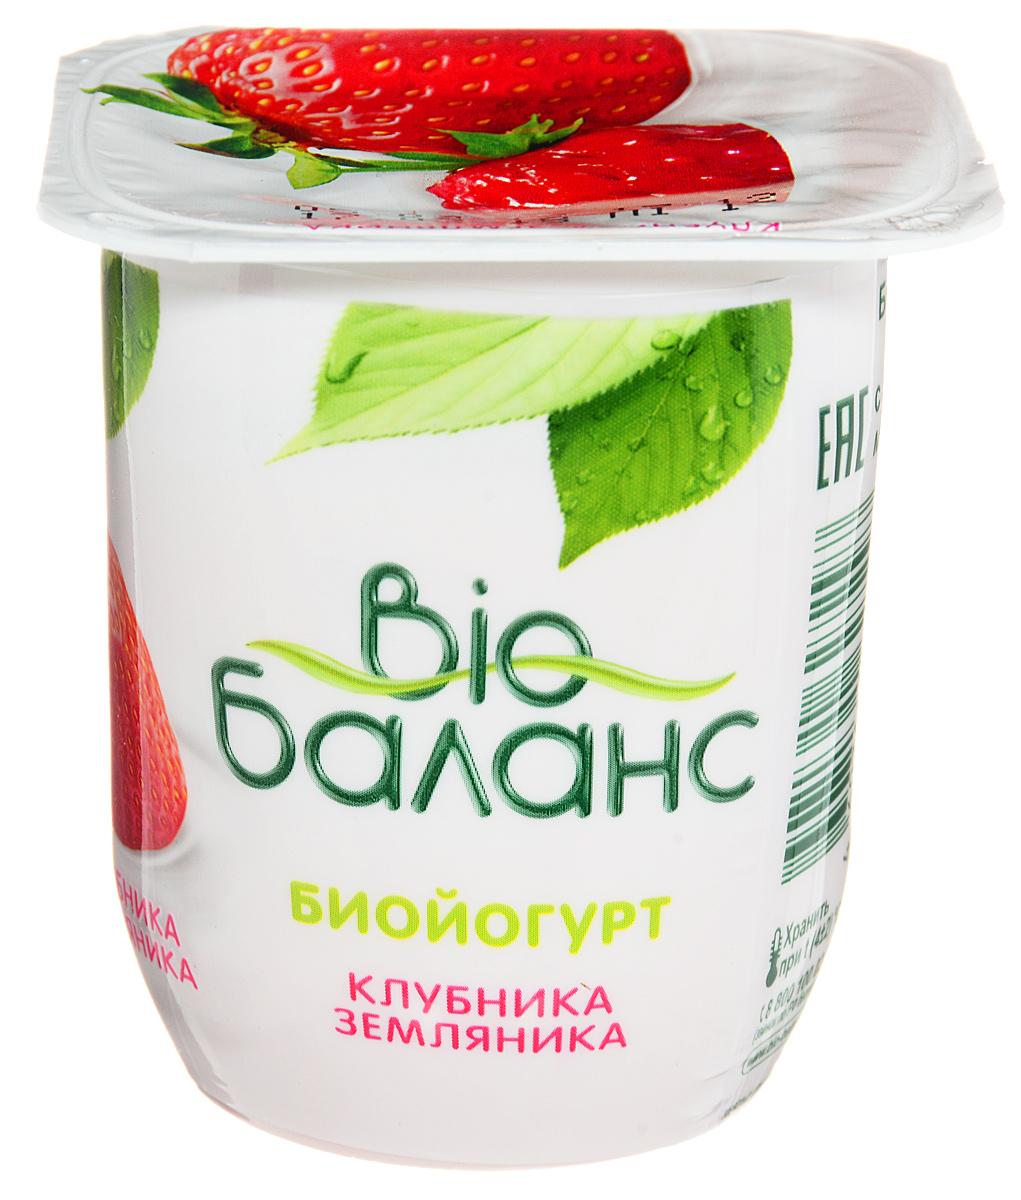 Био-Баланс Биойогурт Клубника земляника Персик банан 2,8%, 125 г киржачский мз йогурт клубника земляника слоеный 130 г